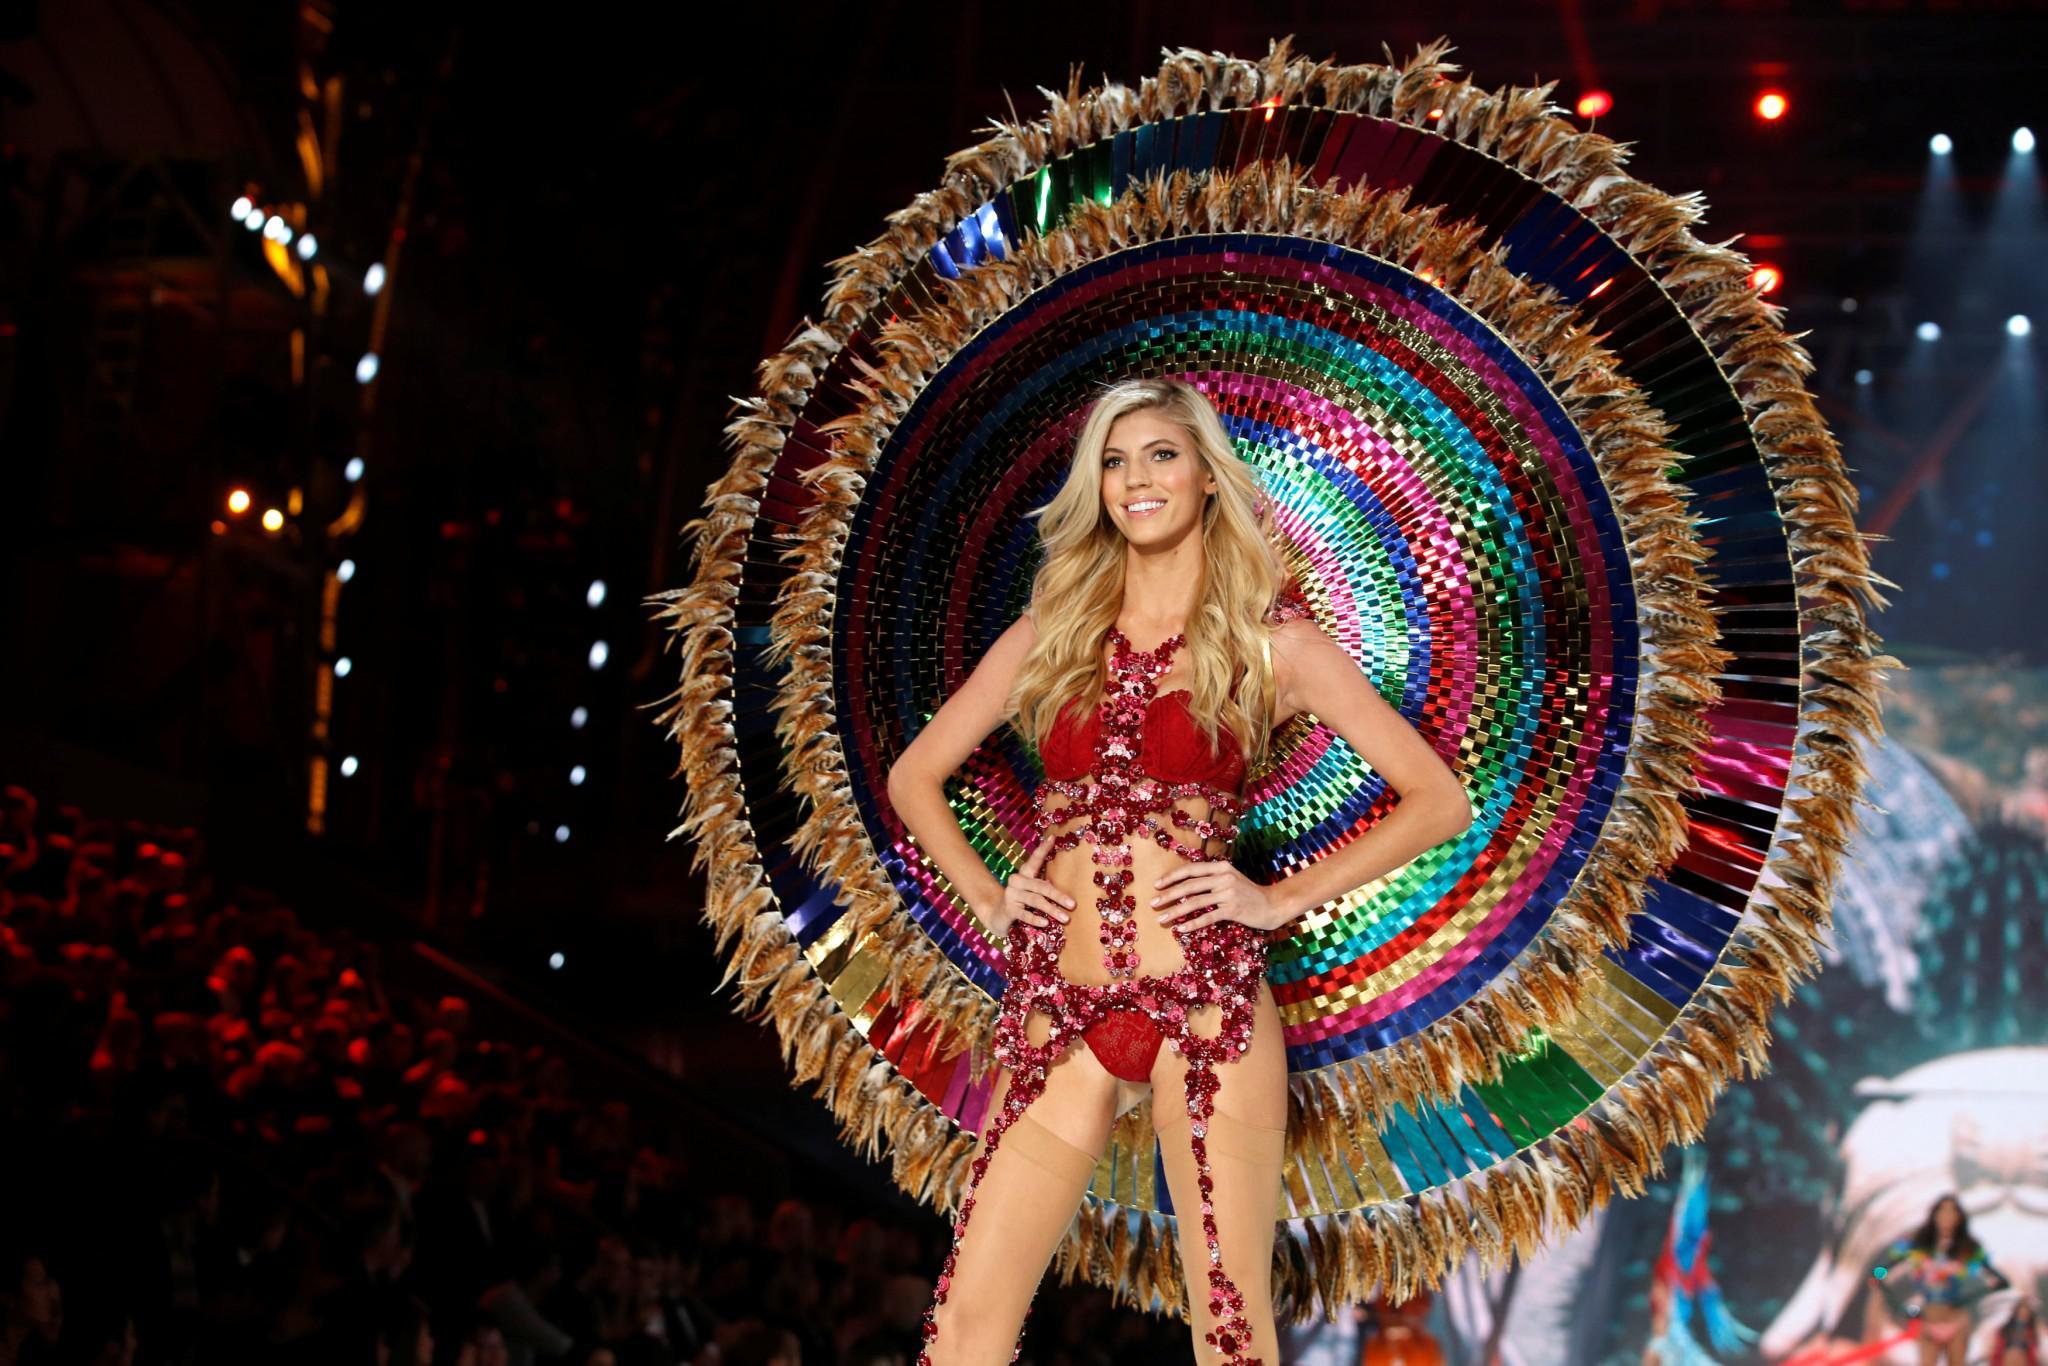 Victoria-Secret-show-esorouxa-modela-1300-6 Το show της Victoria's Secret που «κόλασε» το Παρίσι με τα αγγελάκια της